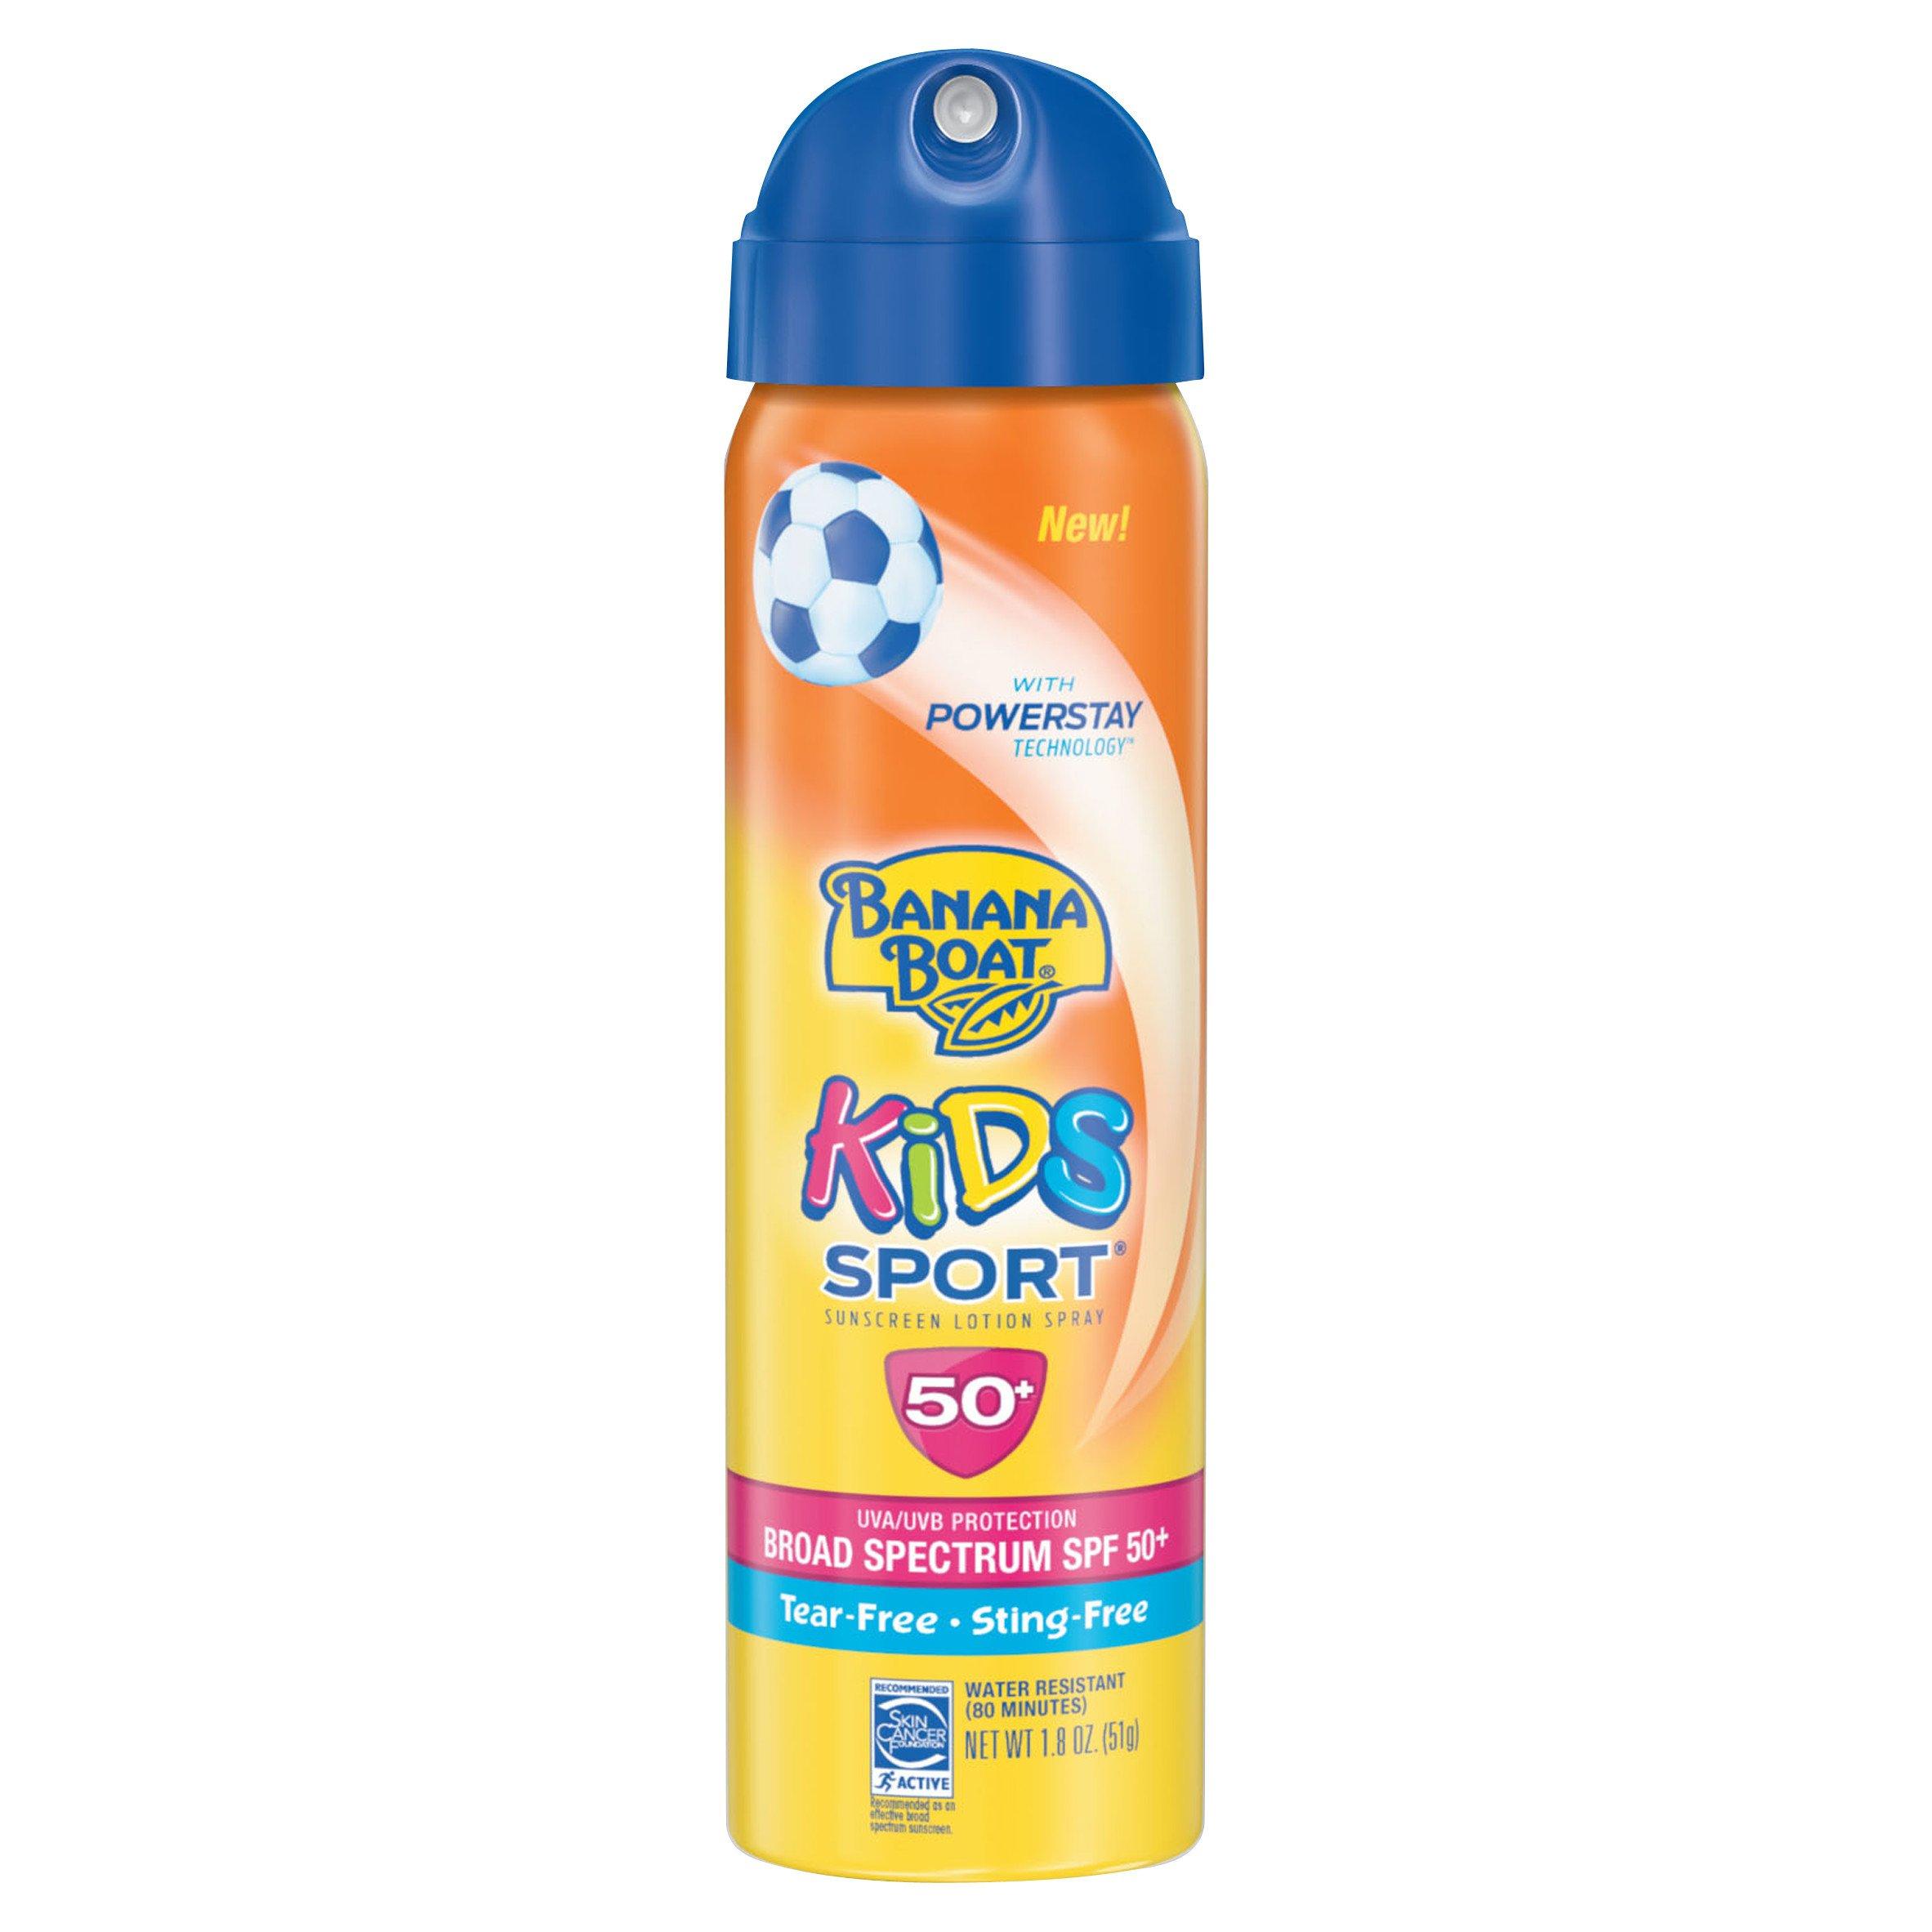 Banana Boat Kids Sport Sunscreen Lotion Spray SPF50+ (case of 24) ORMD